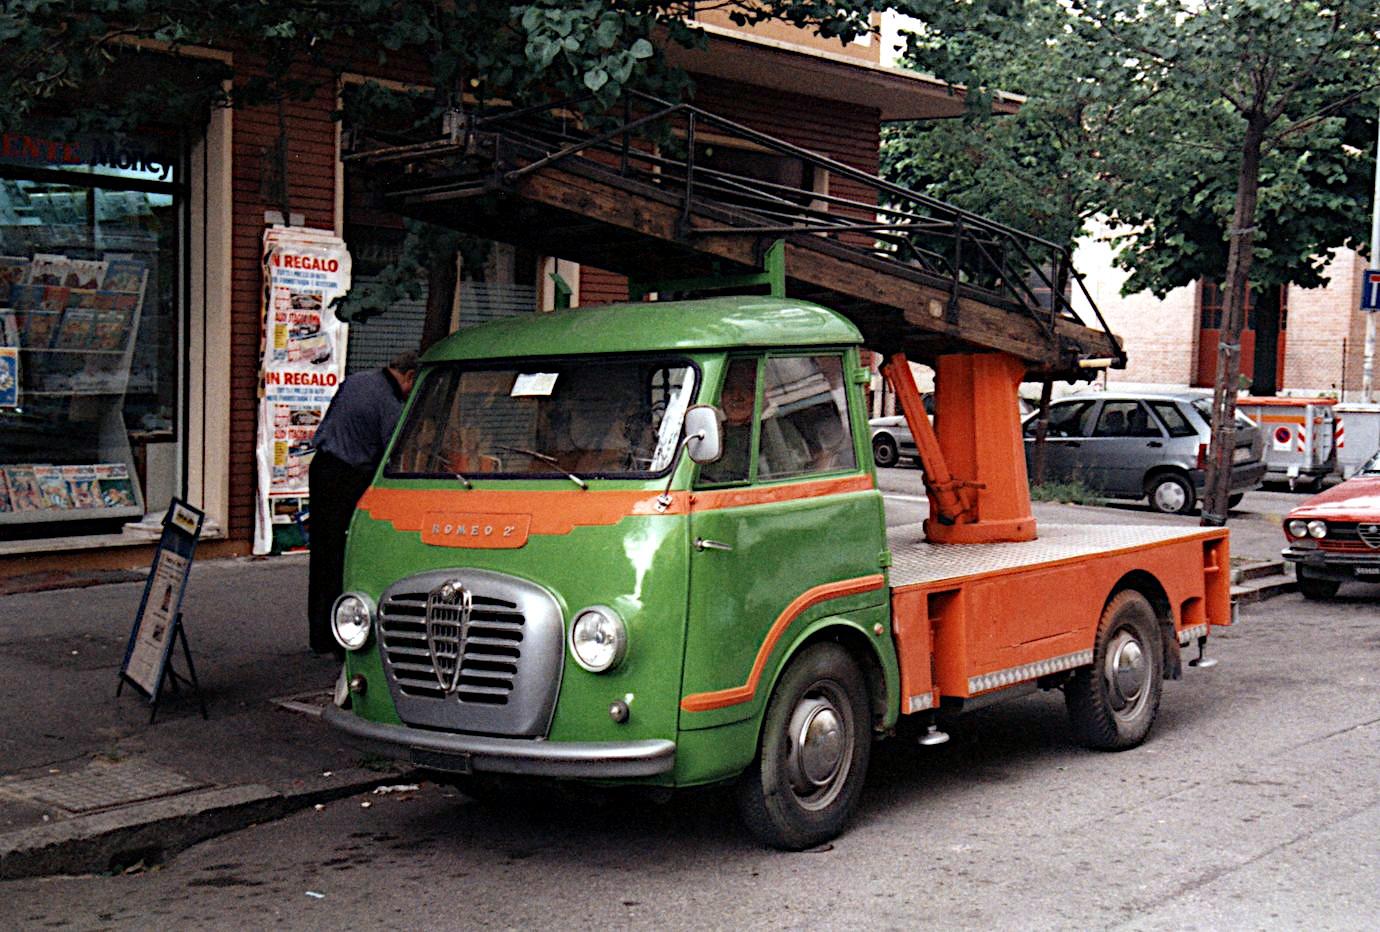 camion definizione AlfaRomeo2_LKW_1